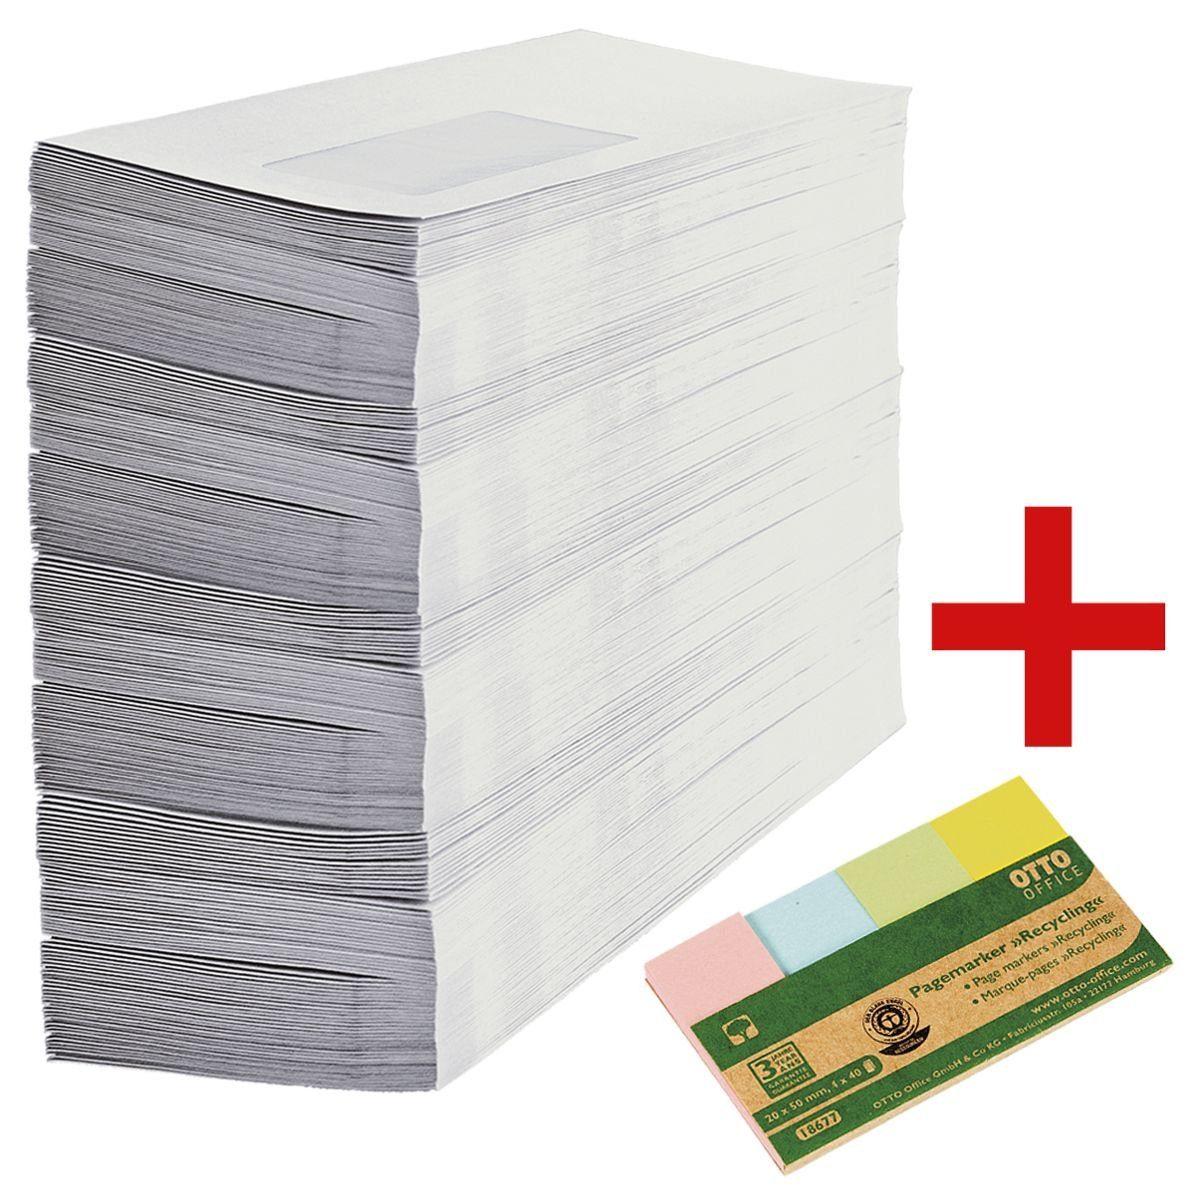 OTTOOFFICE_NATURE Recycling-Briefumschläge inkl. Haftstreifen »Recycl... 1 Set